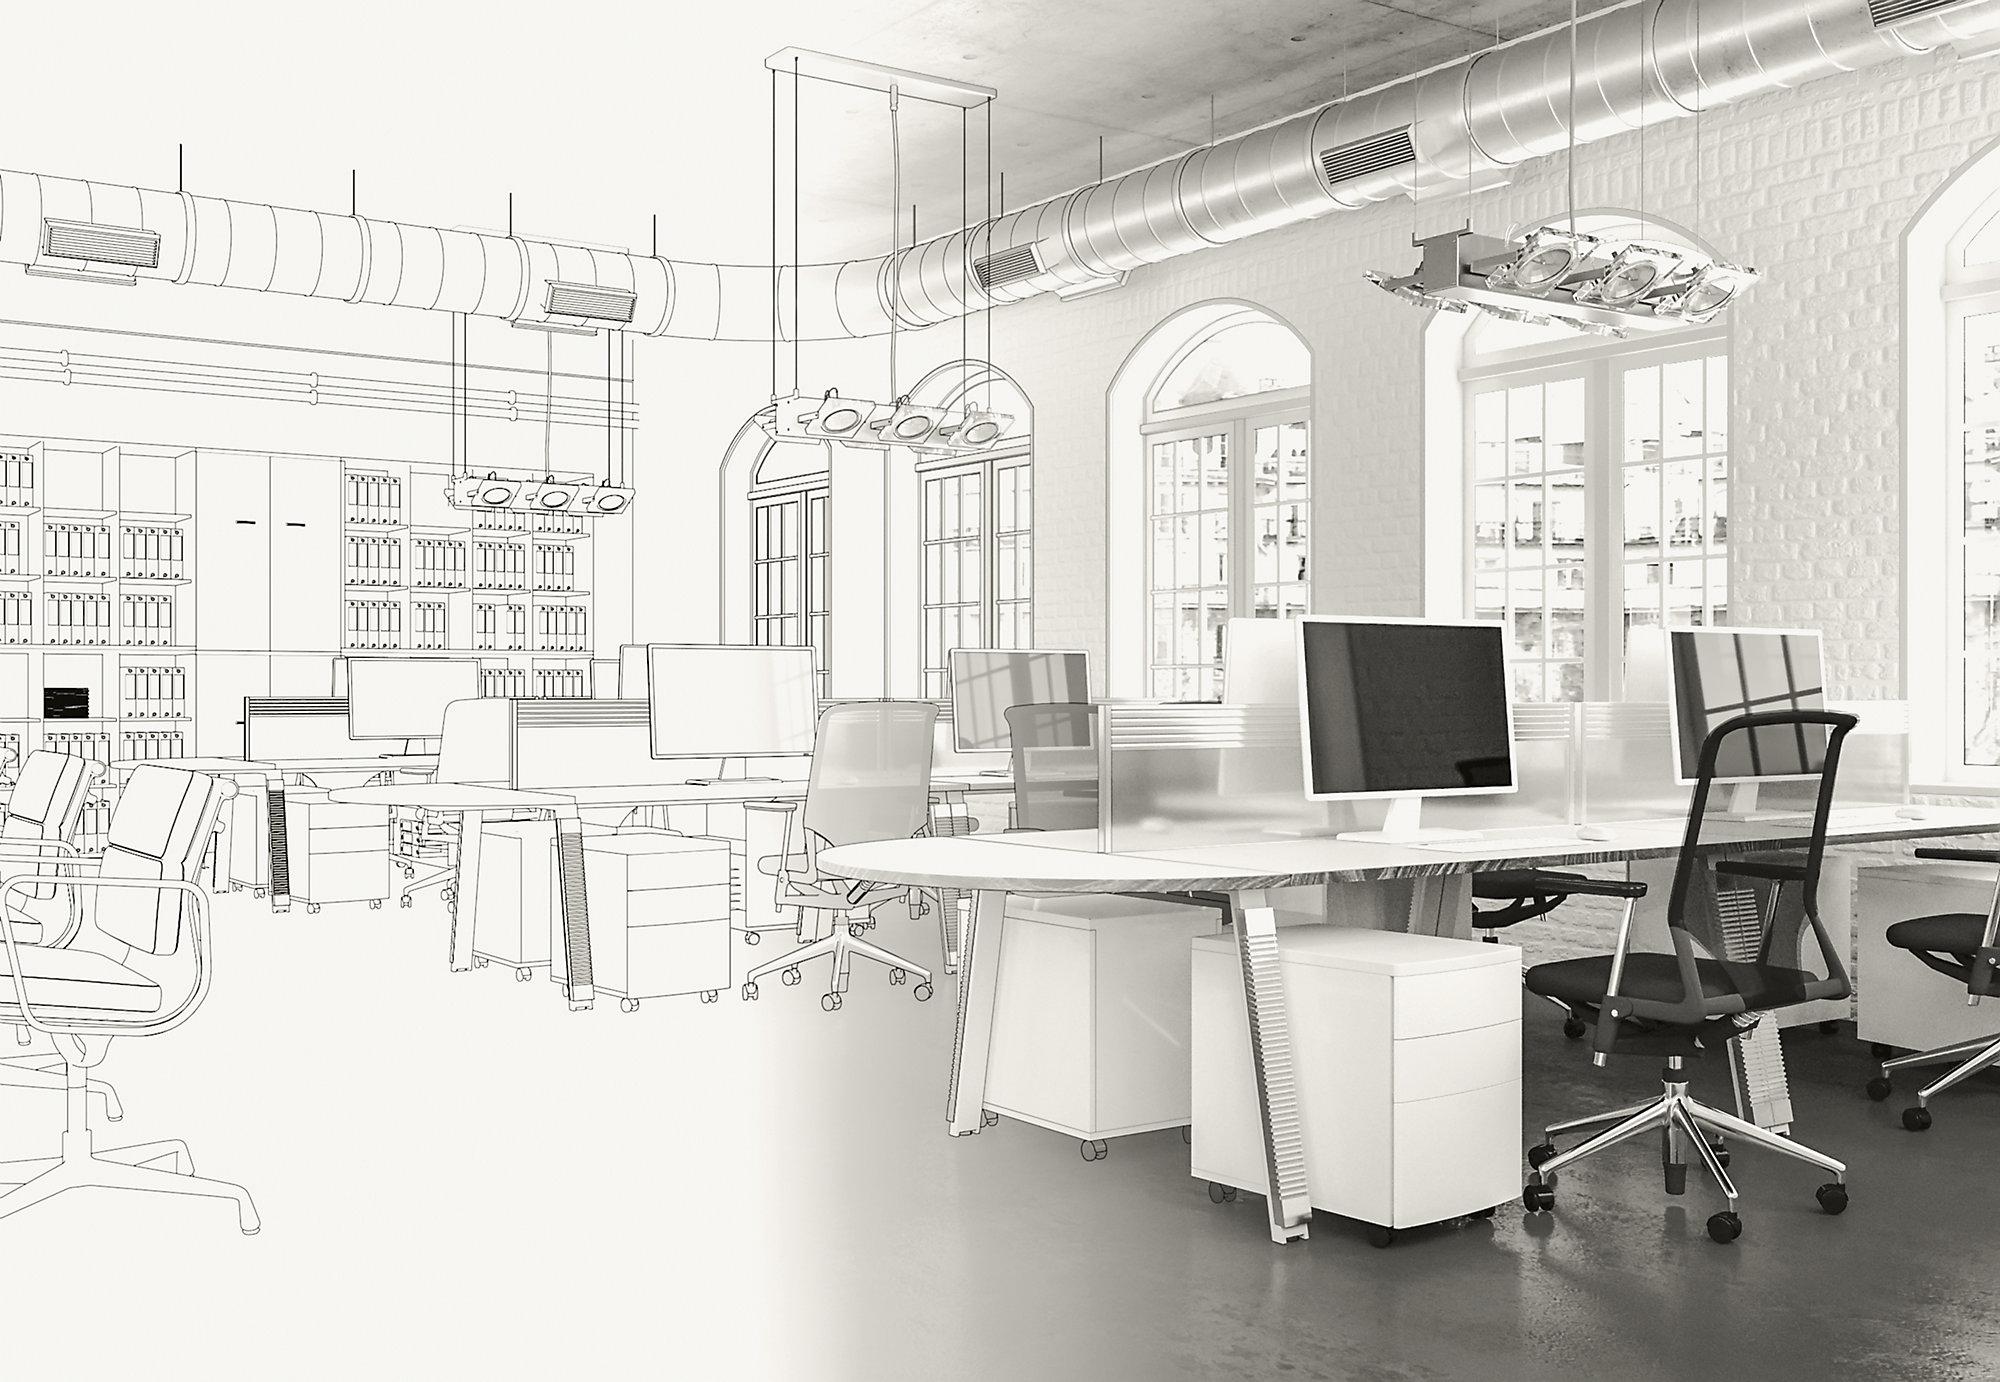 CAD-Planung und Projekte